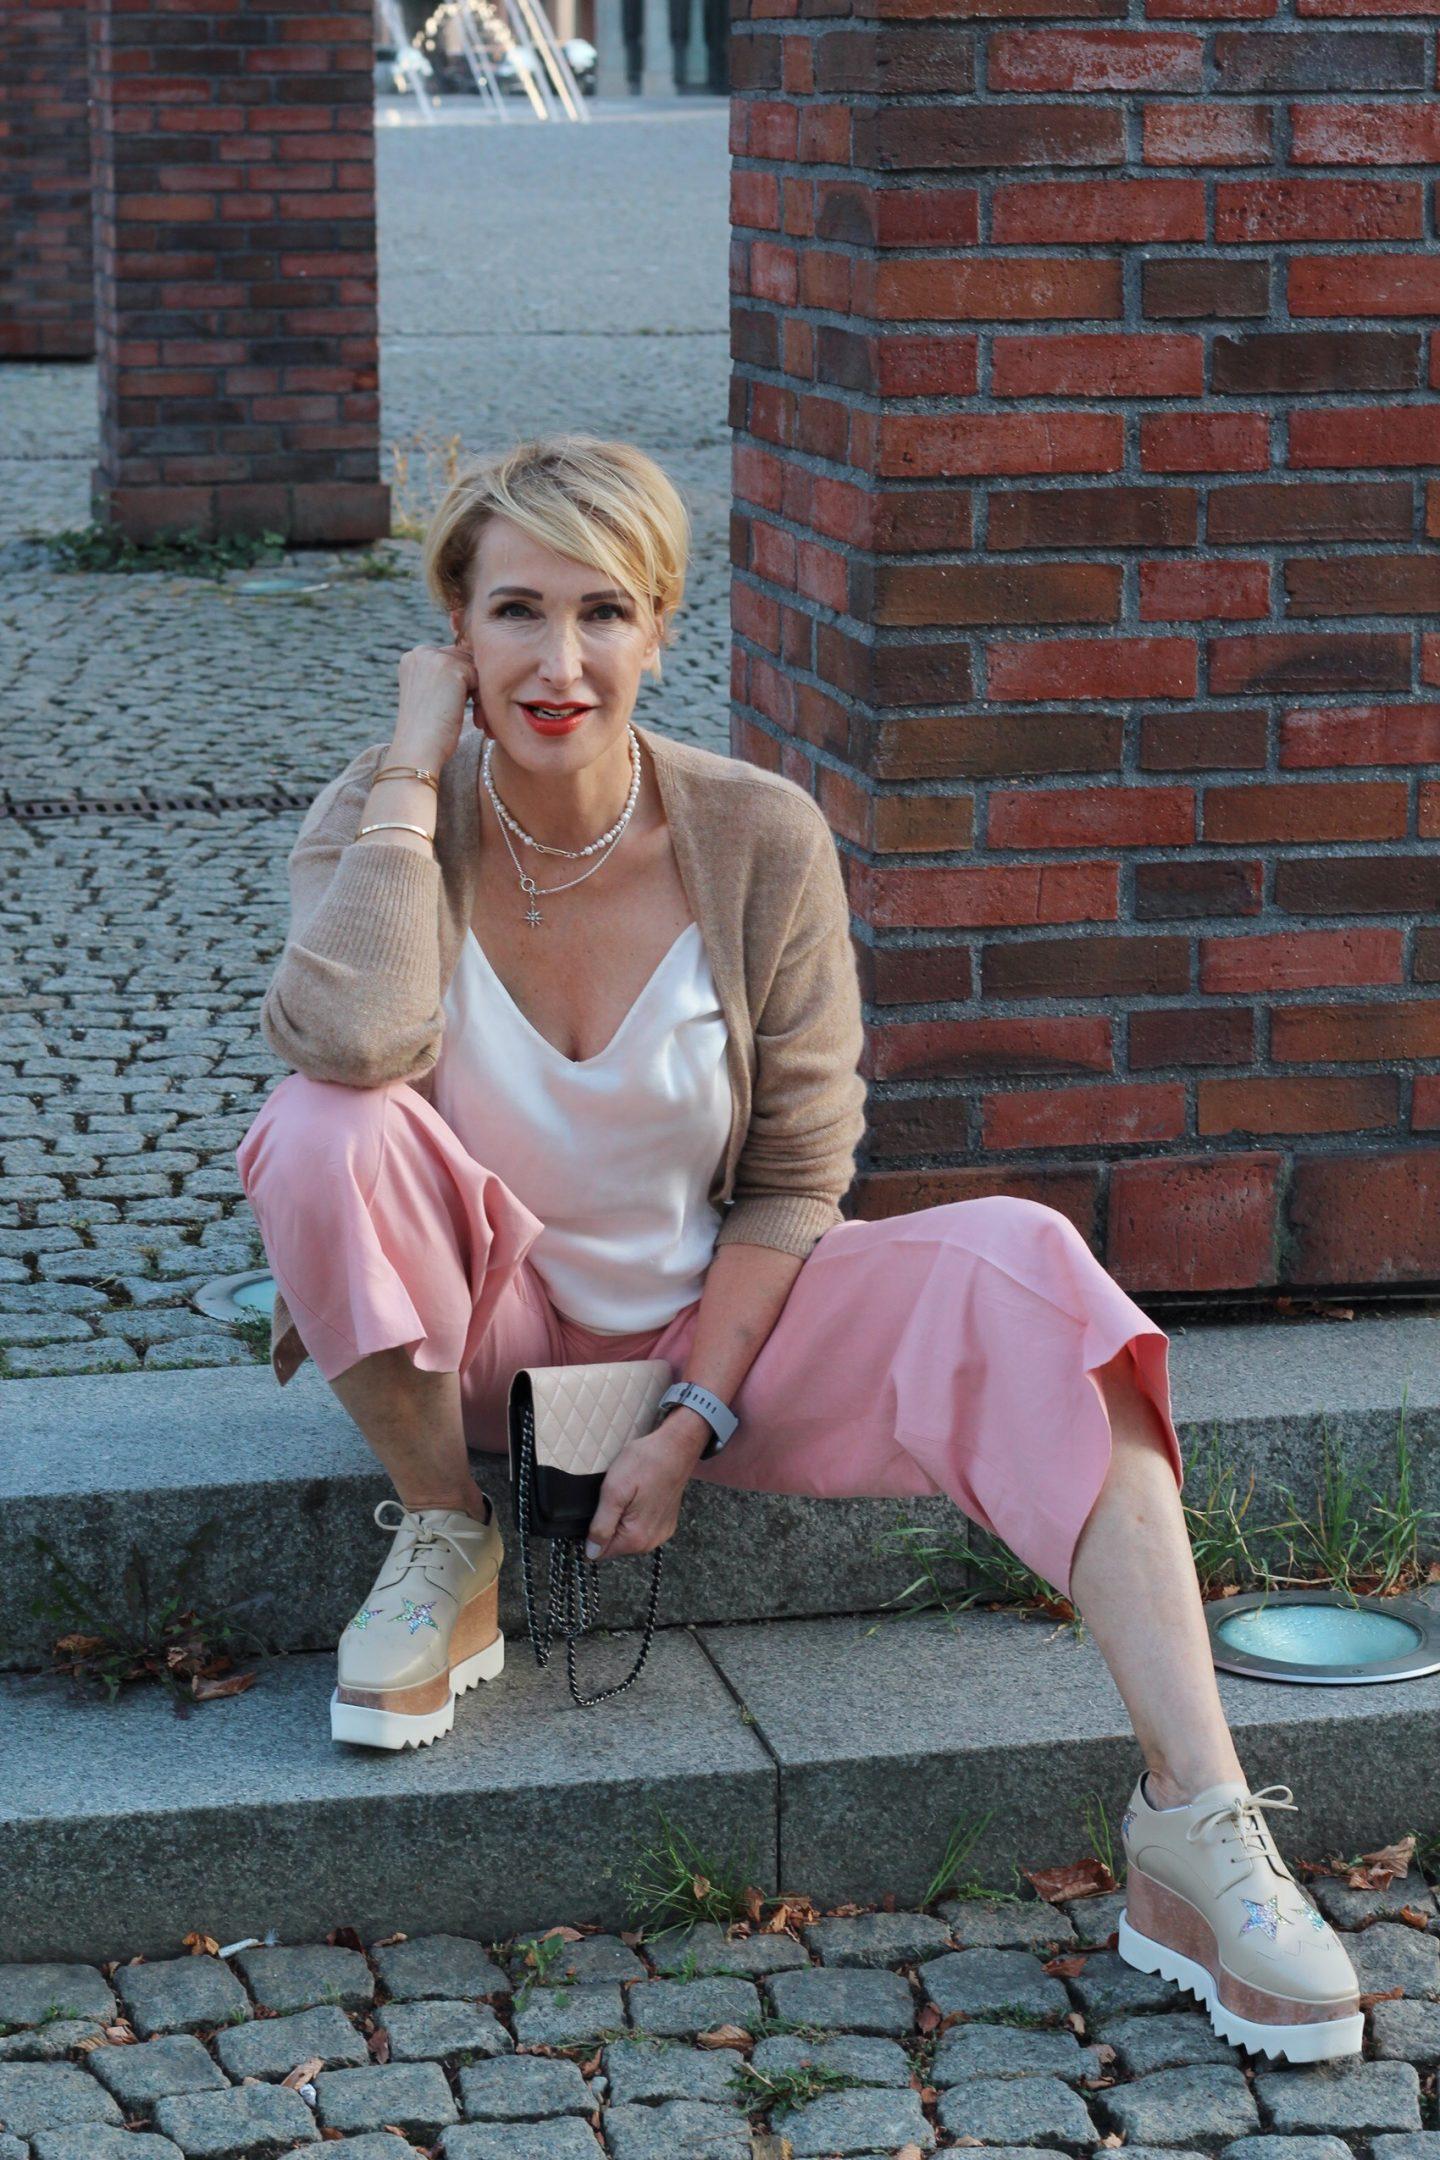 glamupyourlifestyle stella-mccartney-sneaker Culottes angekommen ü-40-mode ü-40-blog ue-50-blog